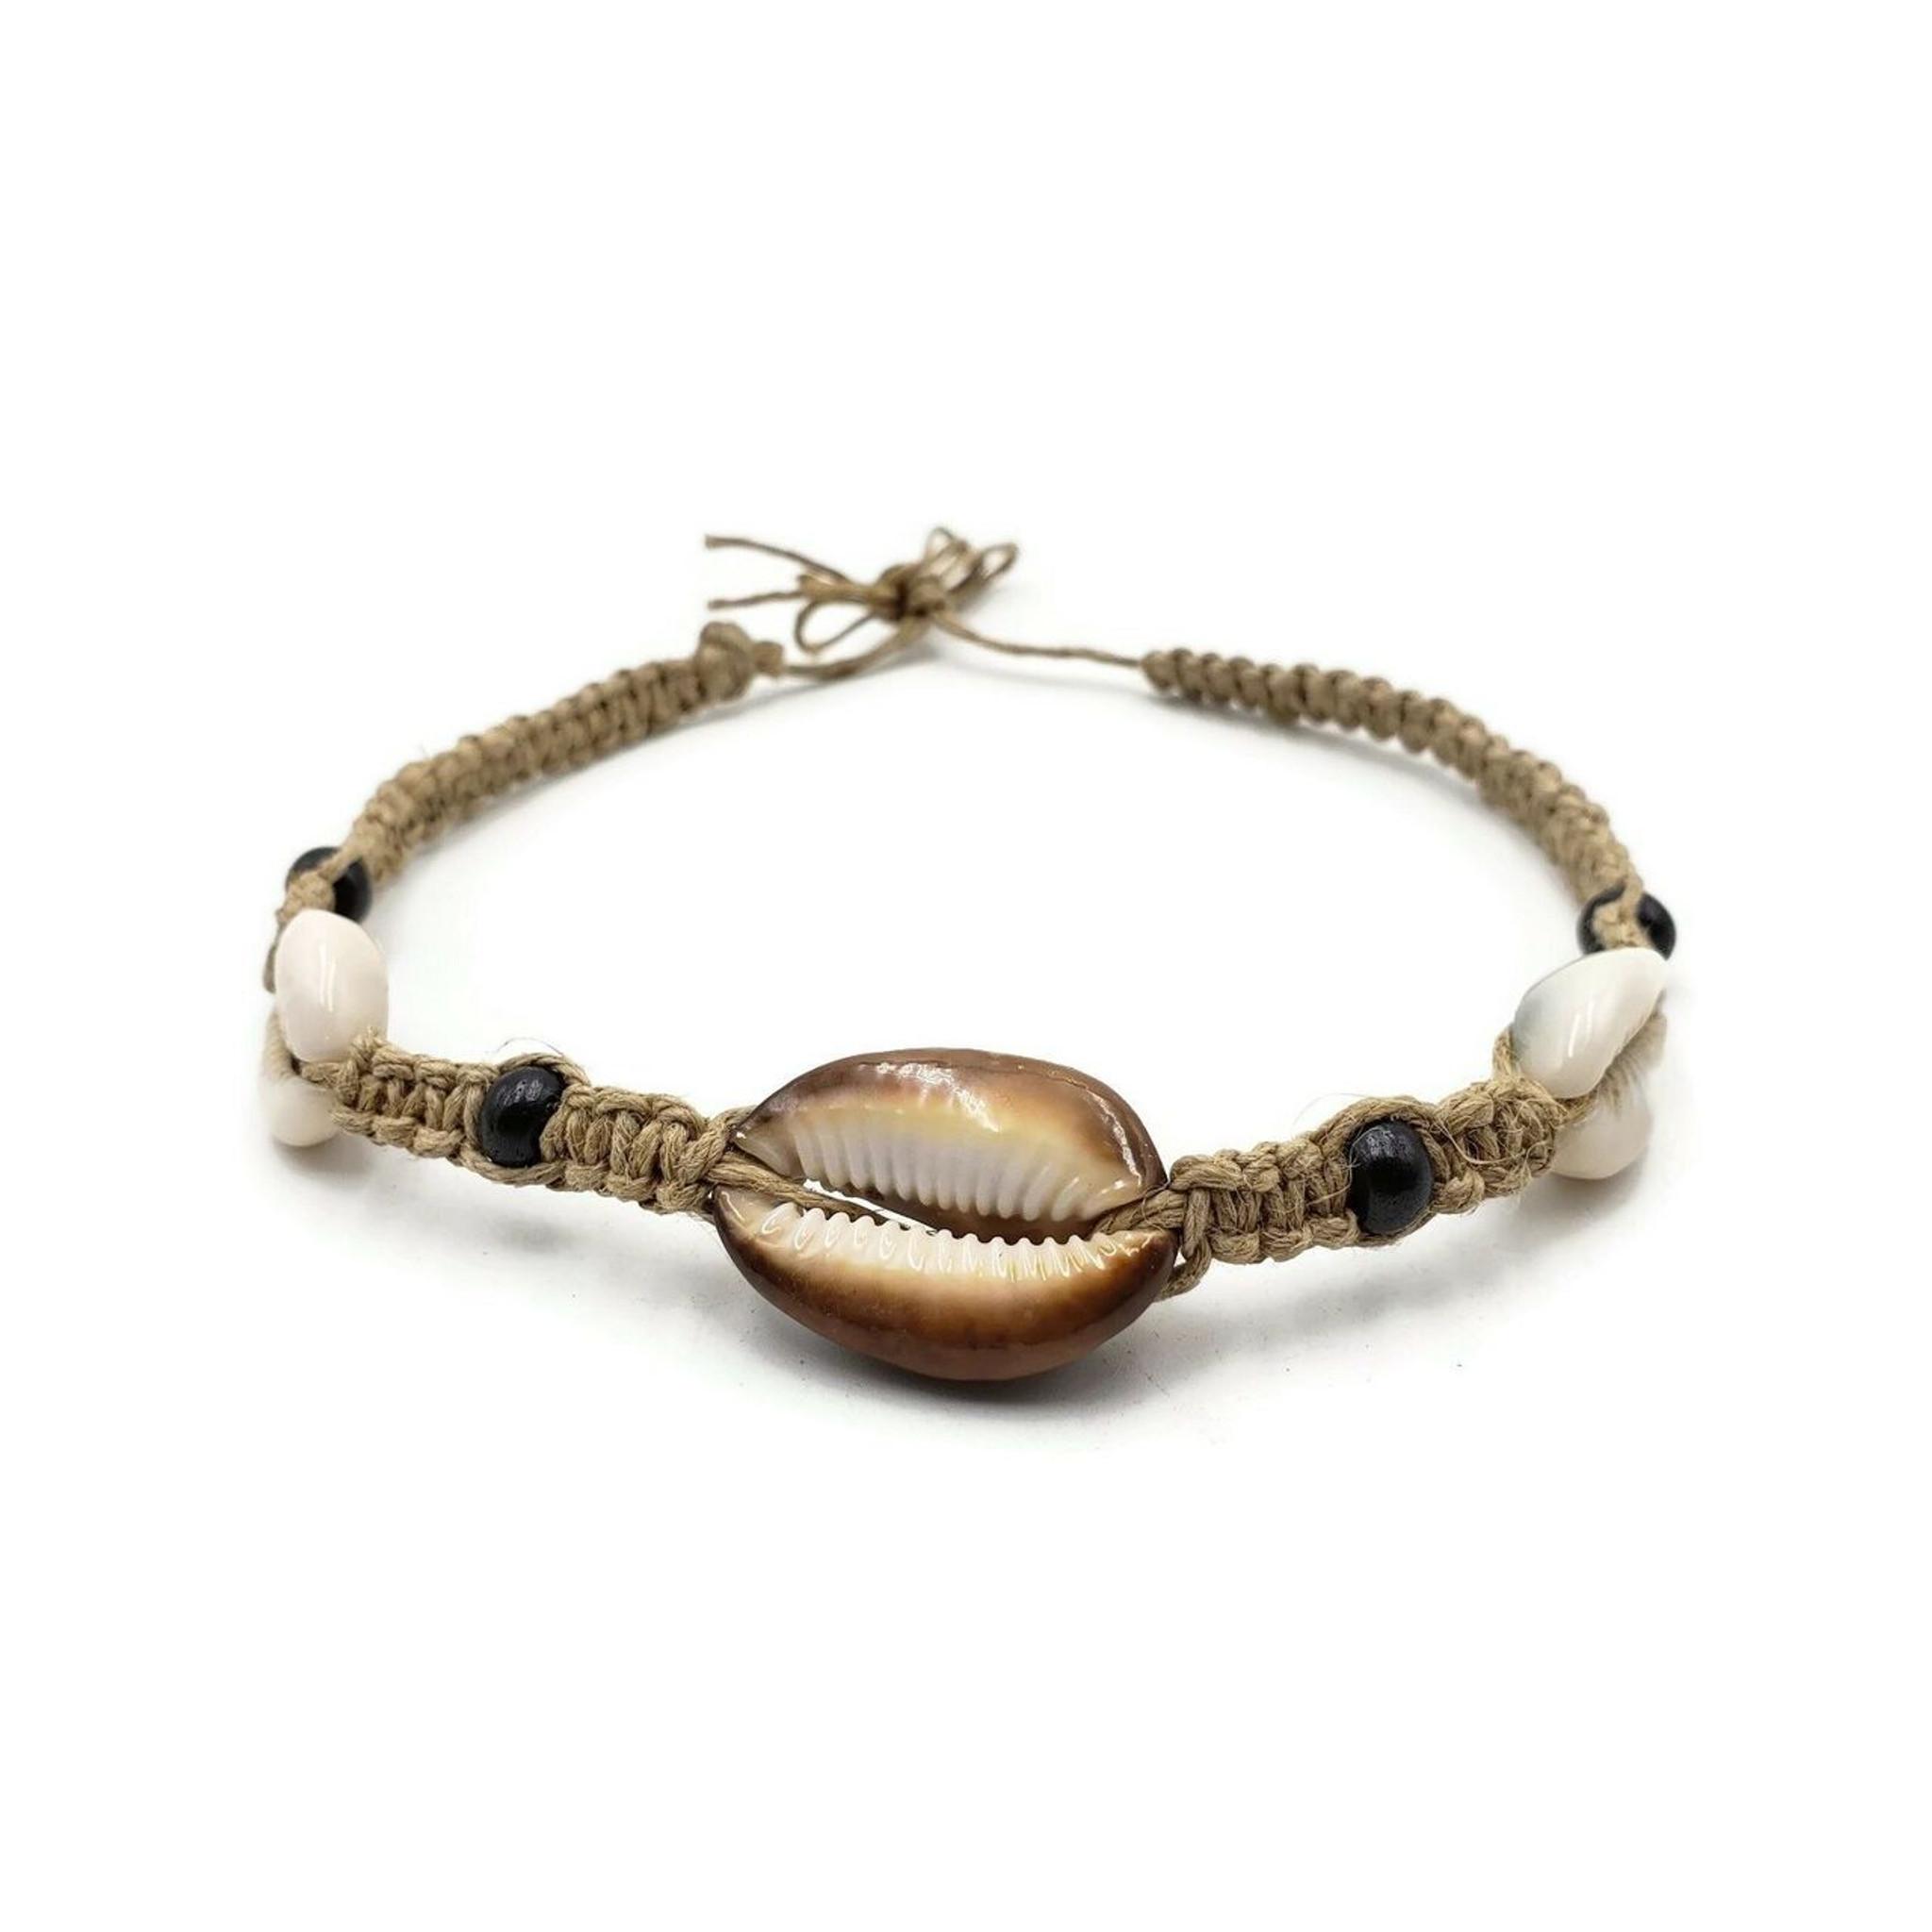 Luna Cowrie Shell Hemp Choker with Bone Beads